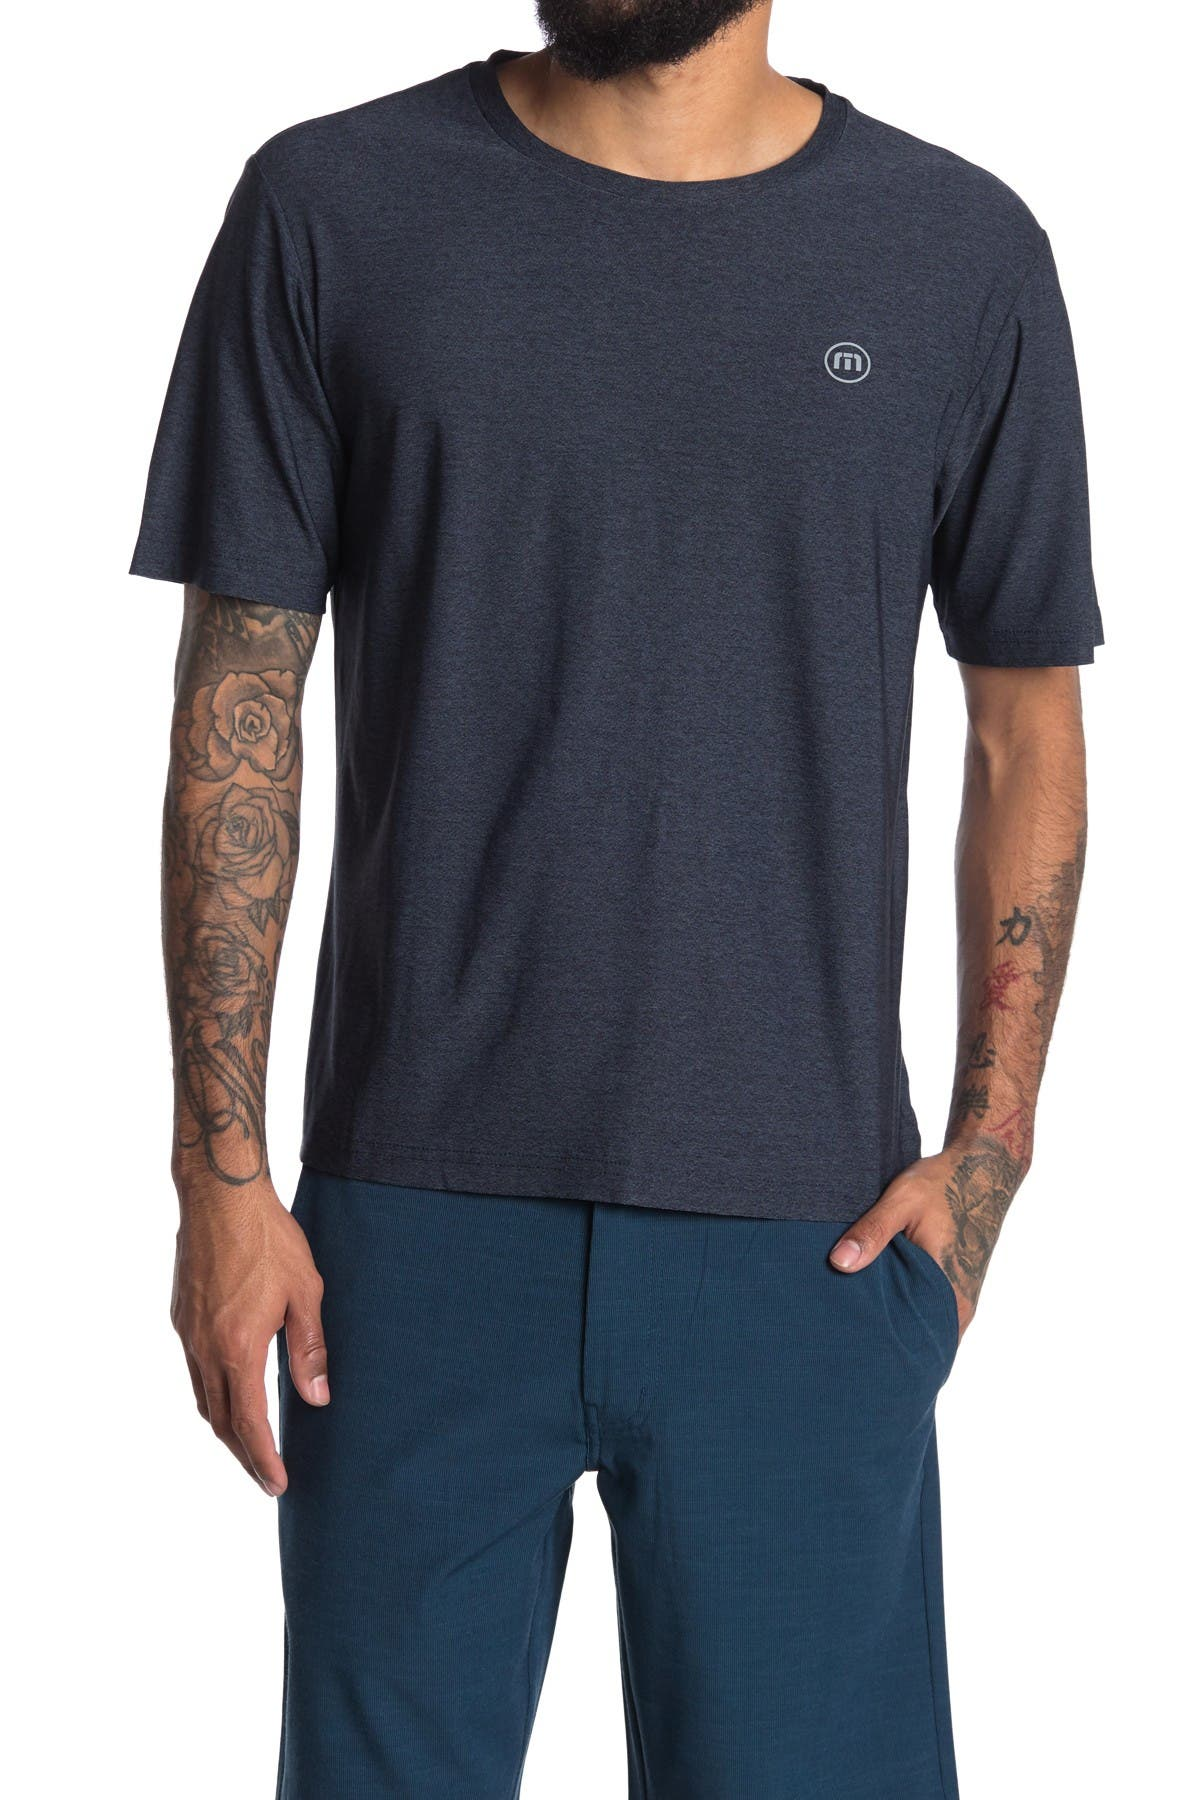 Image of TRAVIS MATHEW Drafter Shirt